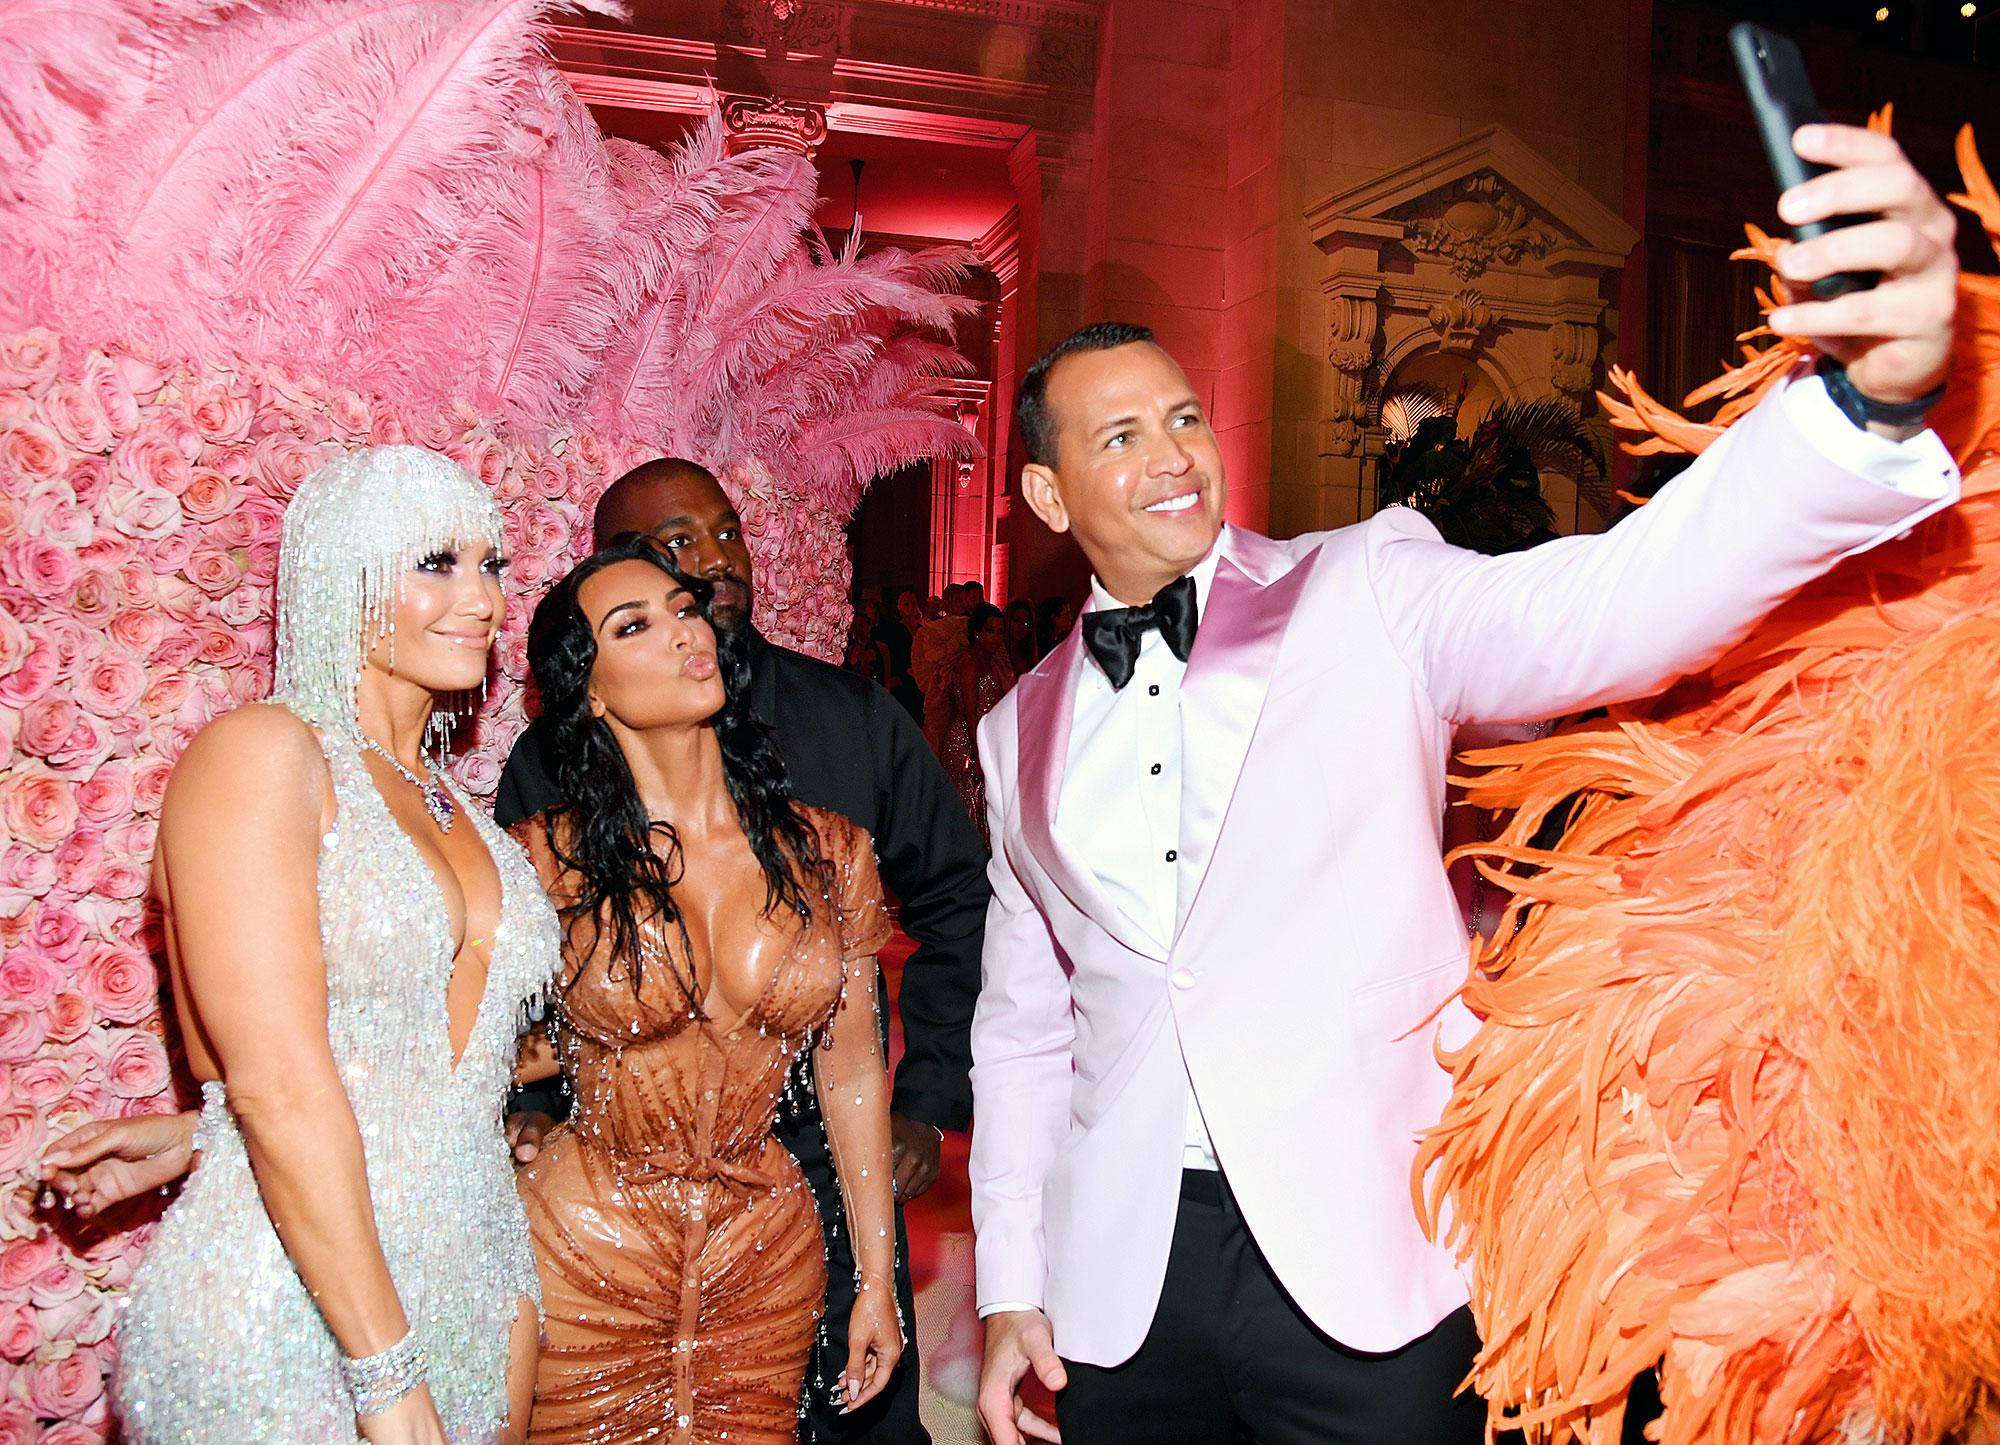 Met Gala 2019 What You Didnt See Jennifer Lopez Kim Kardashian West Kanye West Alex Rodriguez Selfie - Alex Rodriguez snapped a selfie with fiancée Jennifer Lopez, Kim Kardashian and Kanye West.